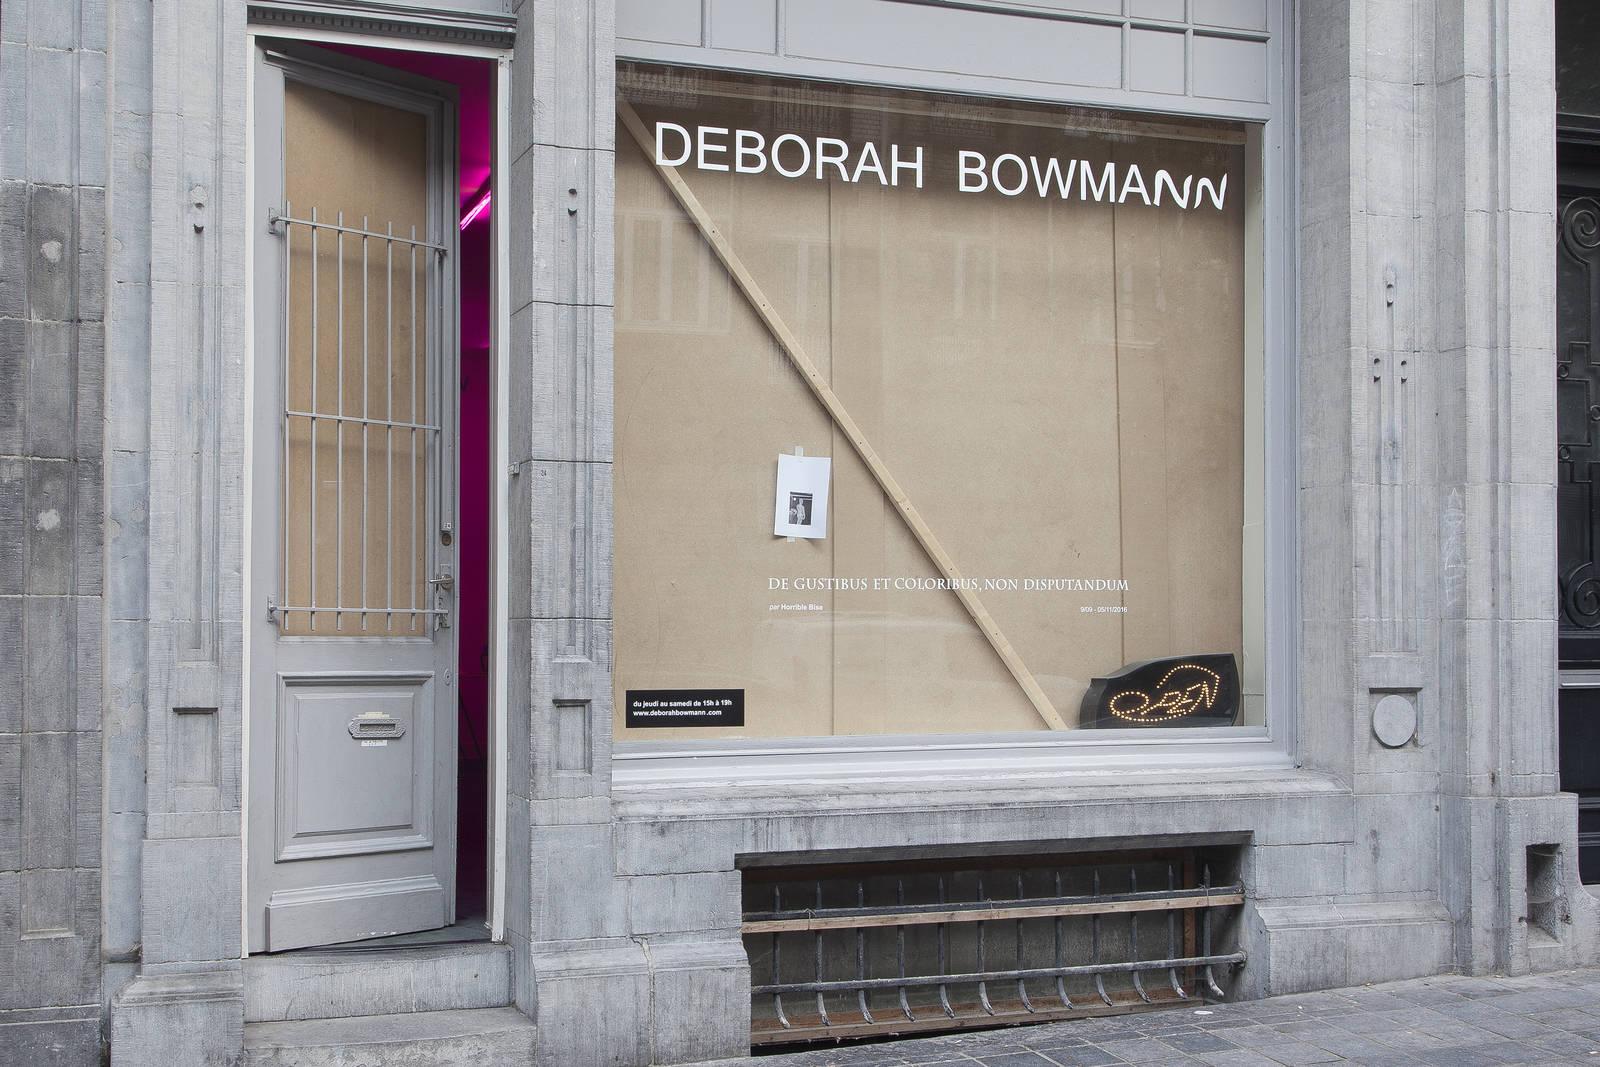 0 - 'De gustibus et coloribus non disputandum' by Horrible Bise at Deborah Bowmann